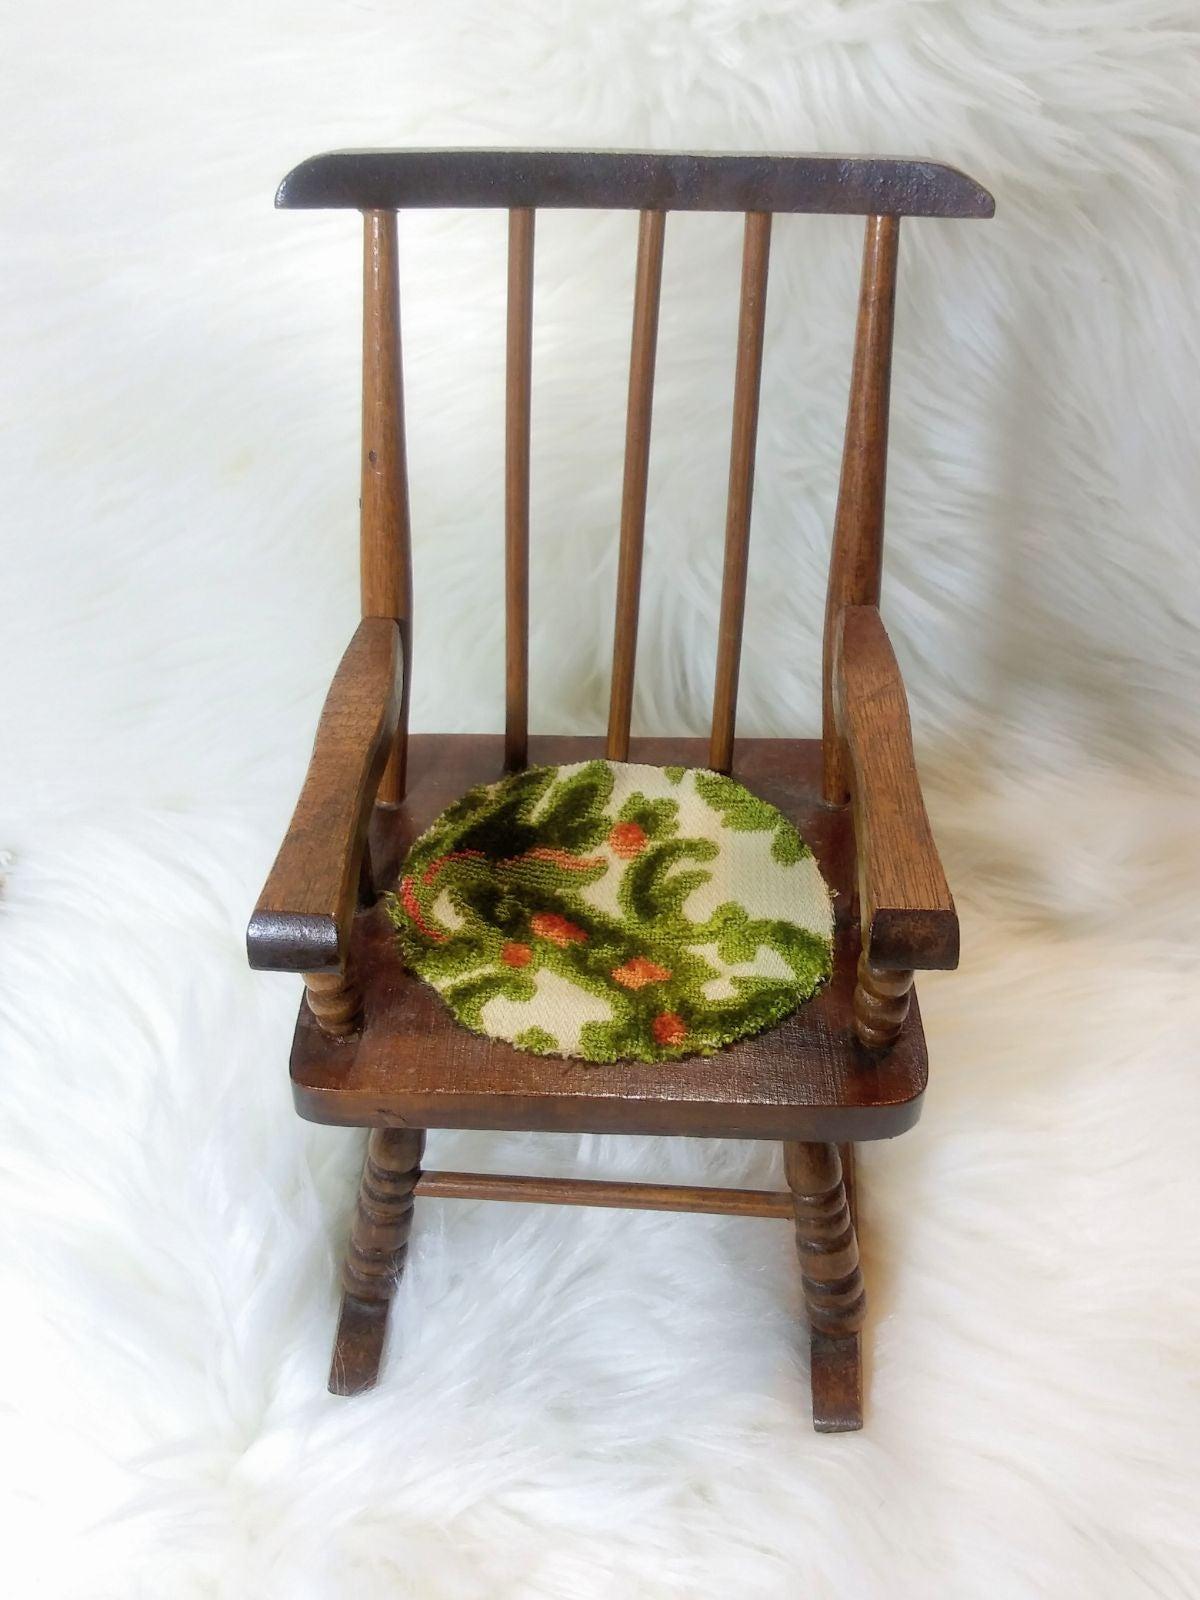 Vintage Brown Wooden Chair